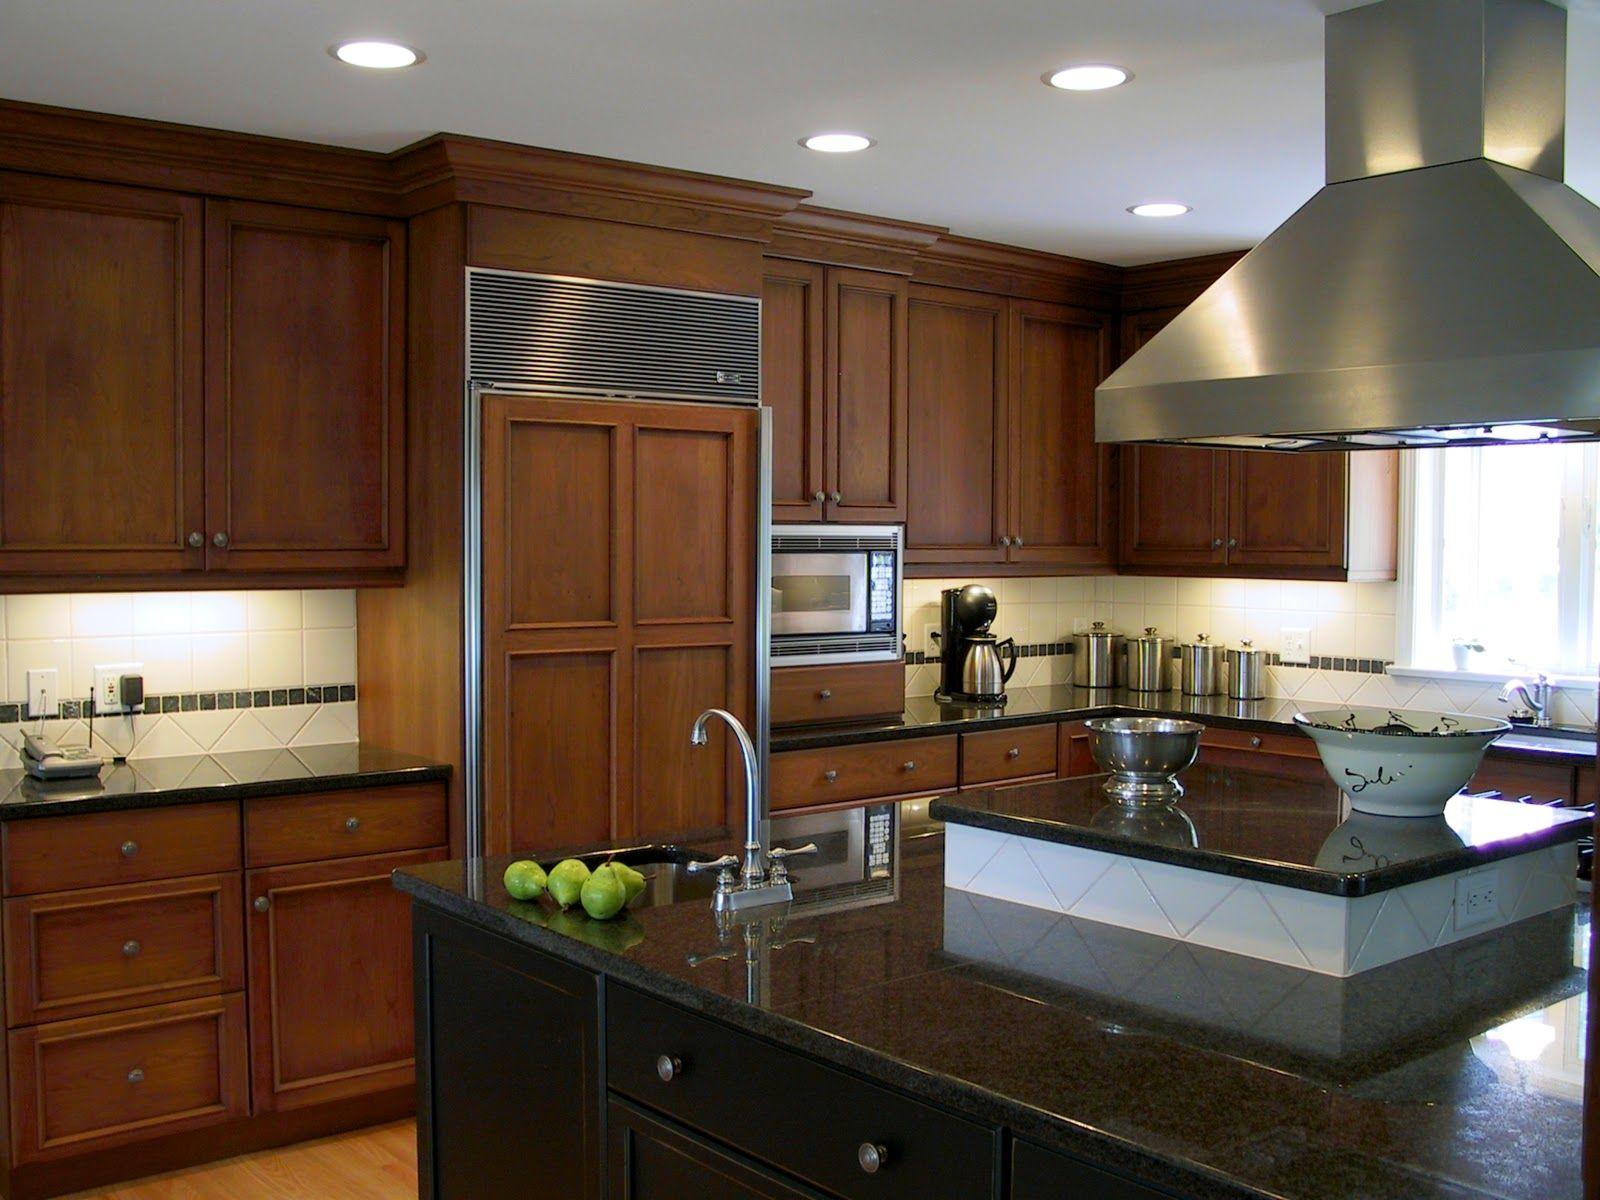 multi level kitchen island designs | style kitchen with ...